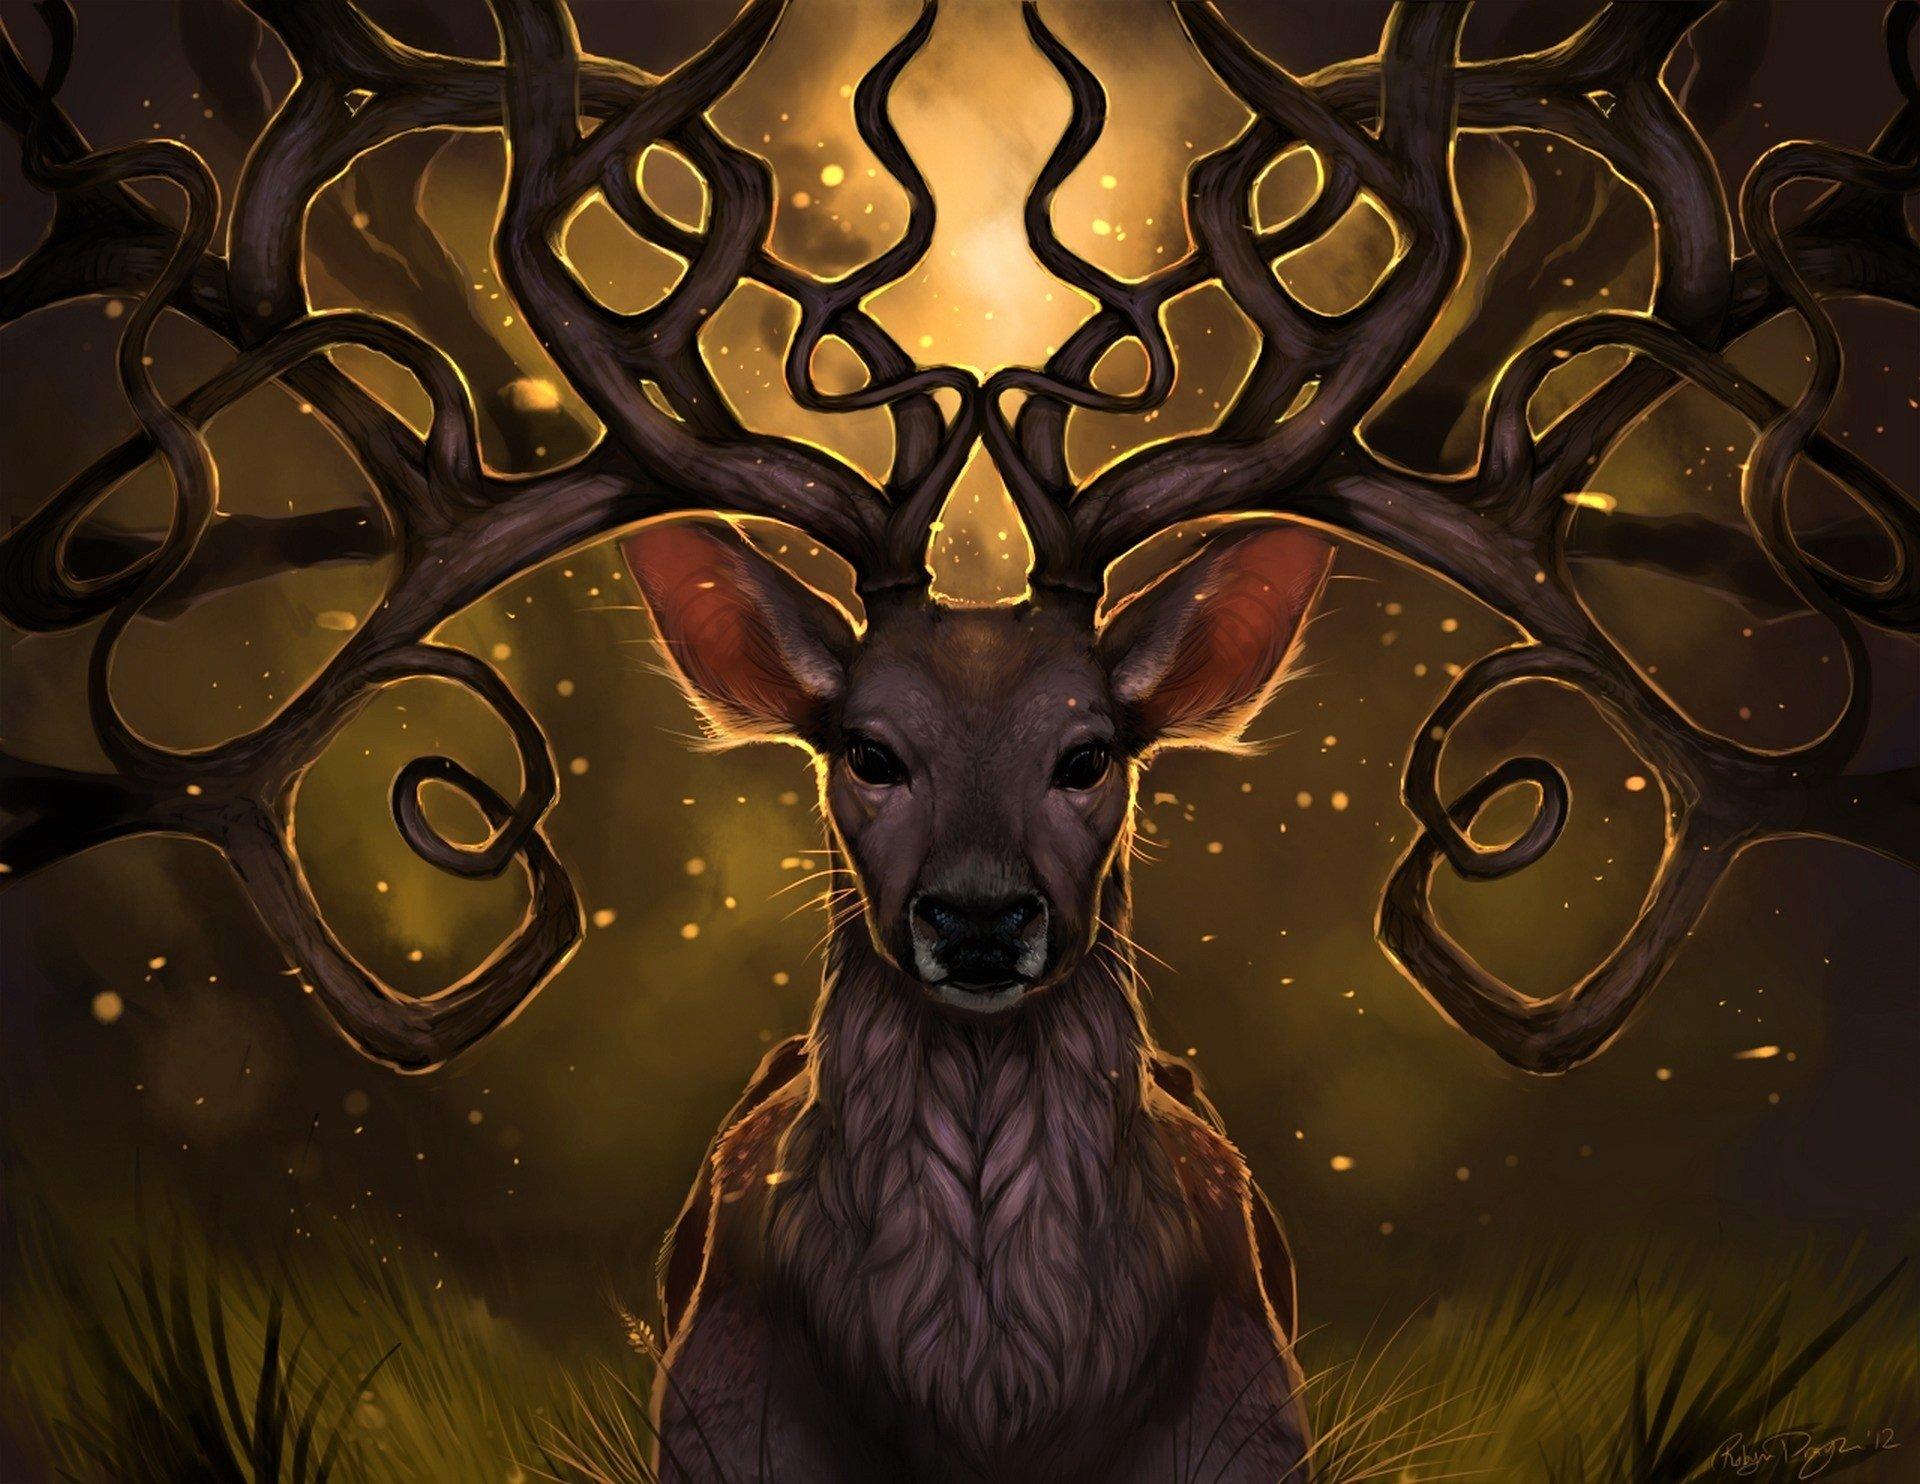 Yule: Sol Invictus